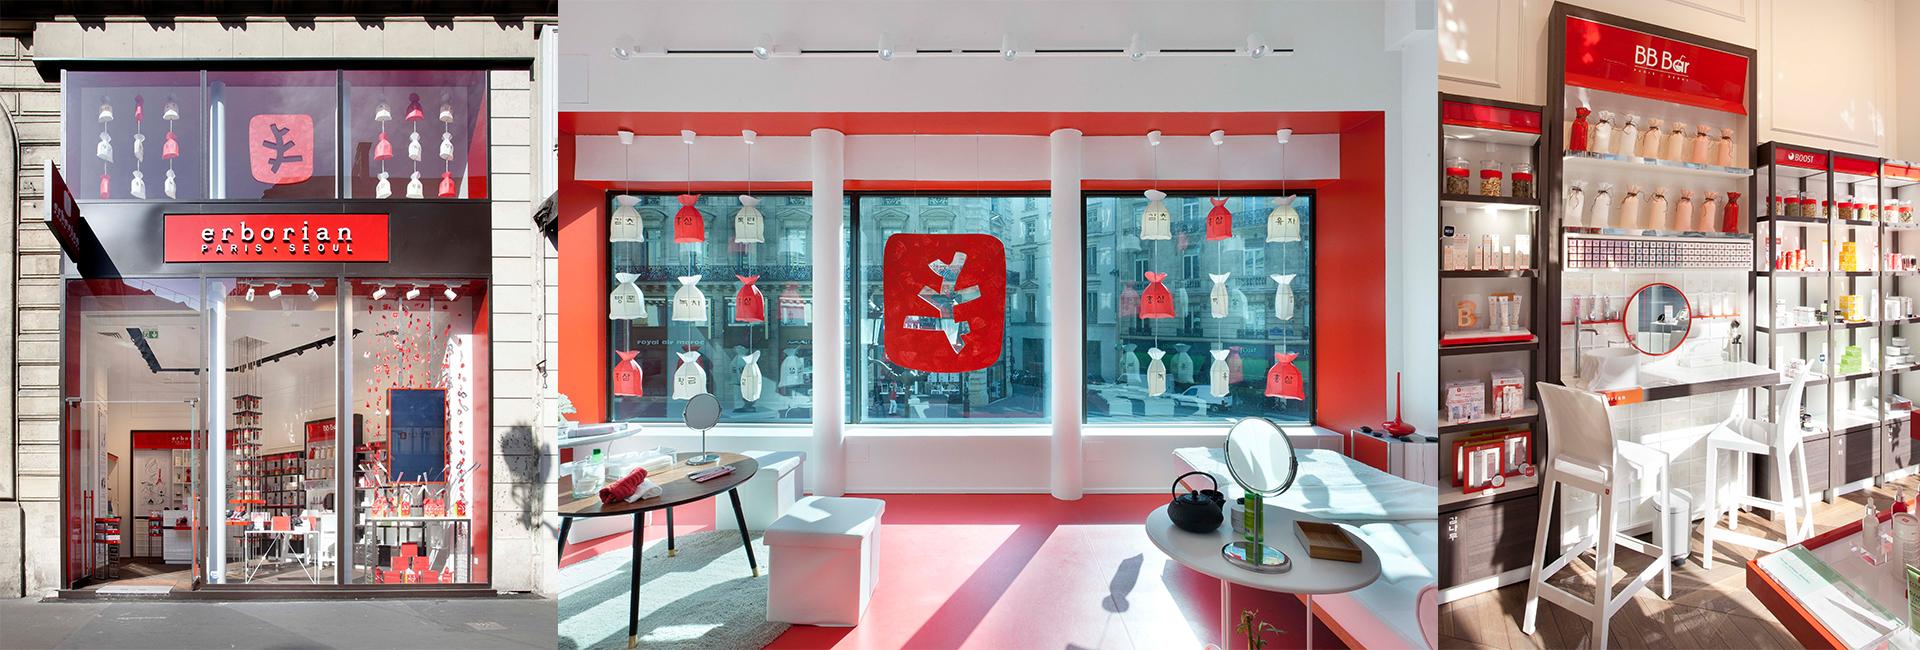 boutique-erborian-paris-opera-blog-beaute-soin-parfum-homme